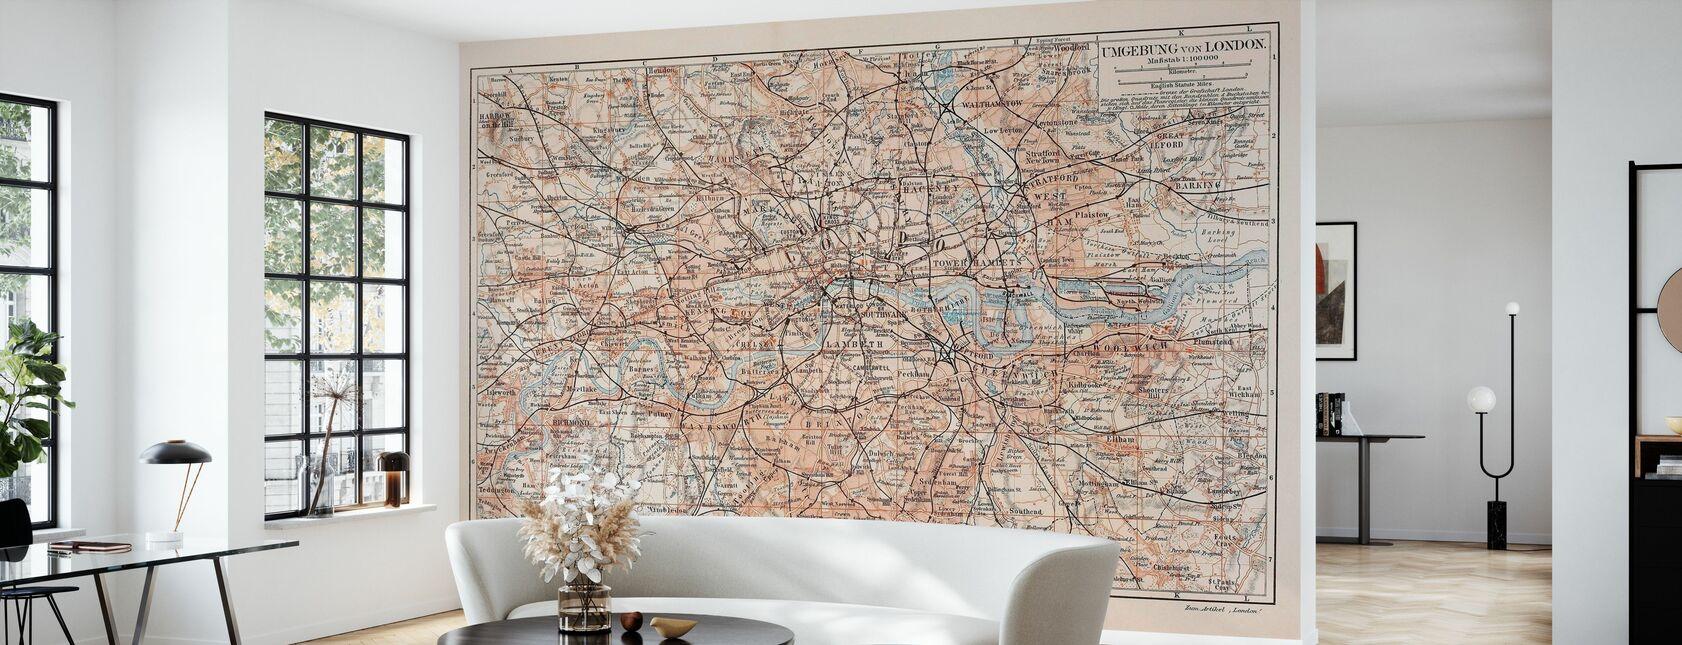 London Map - Wallpaper - Living Room